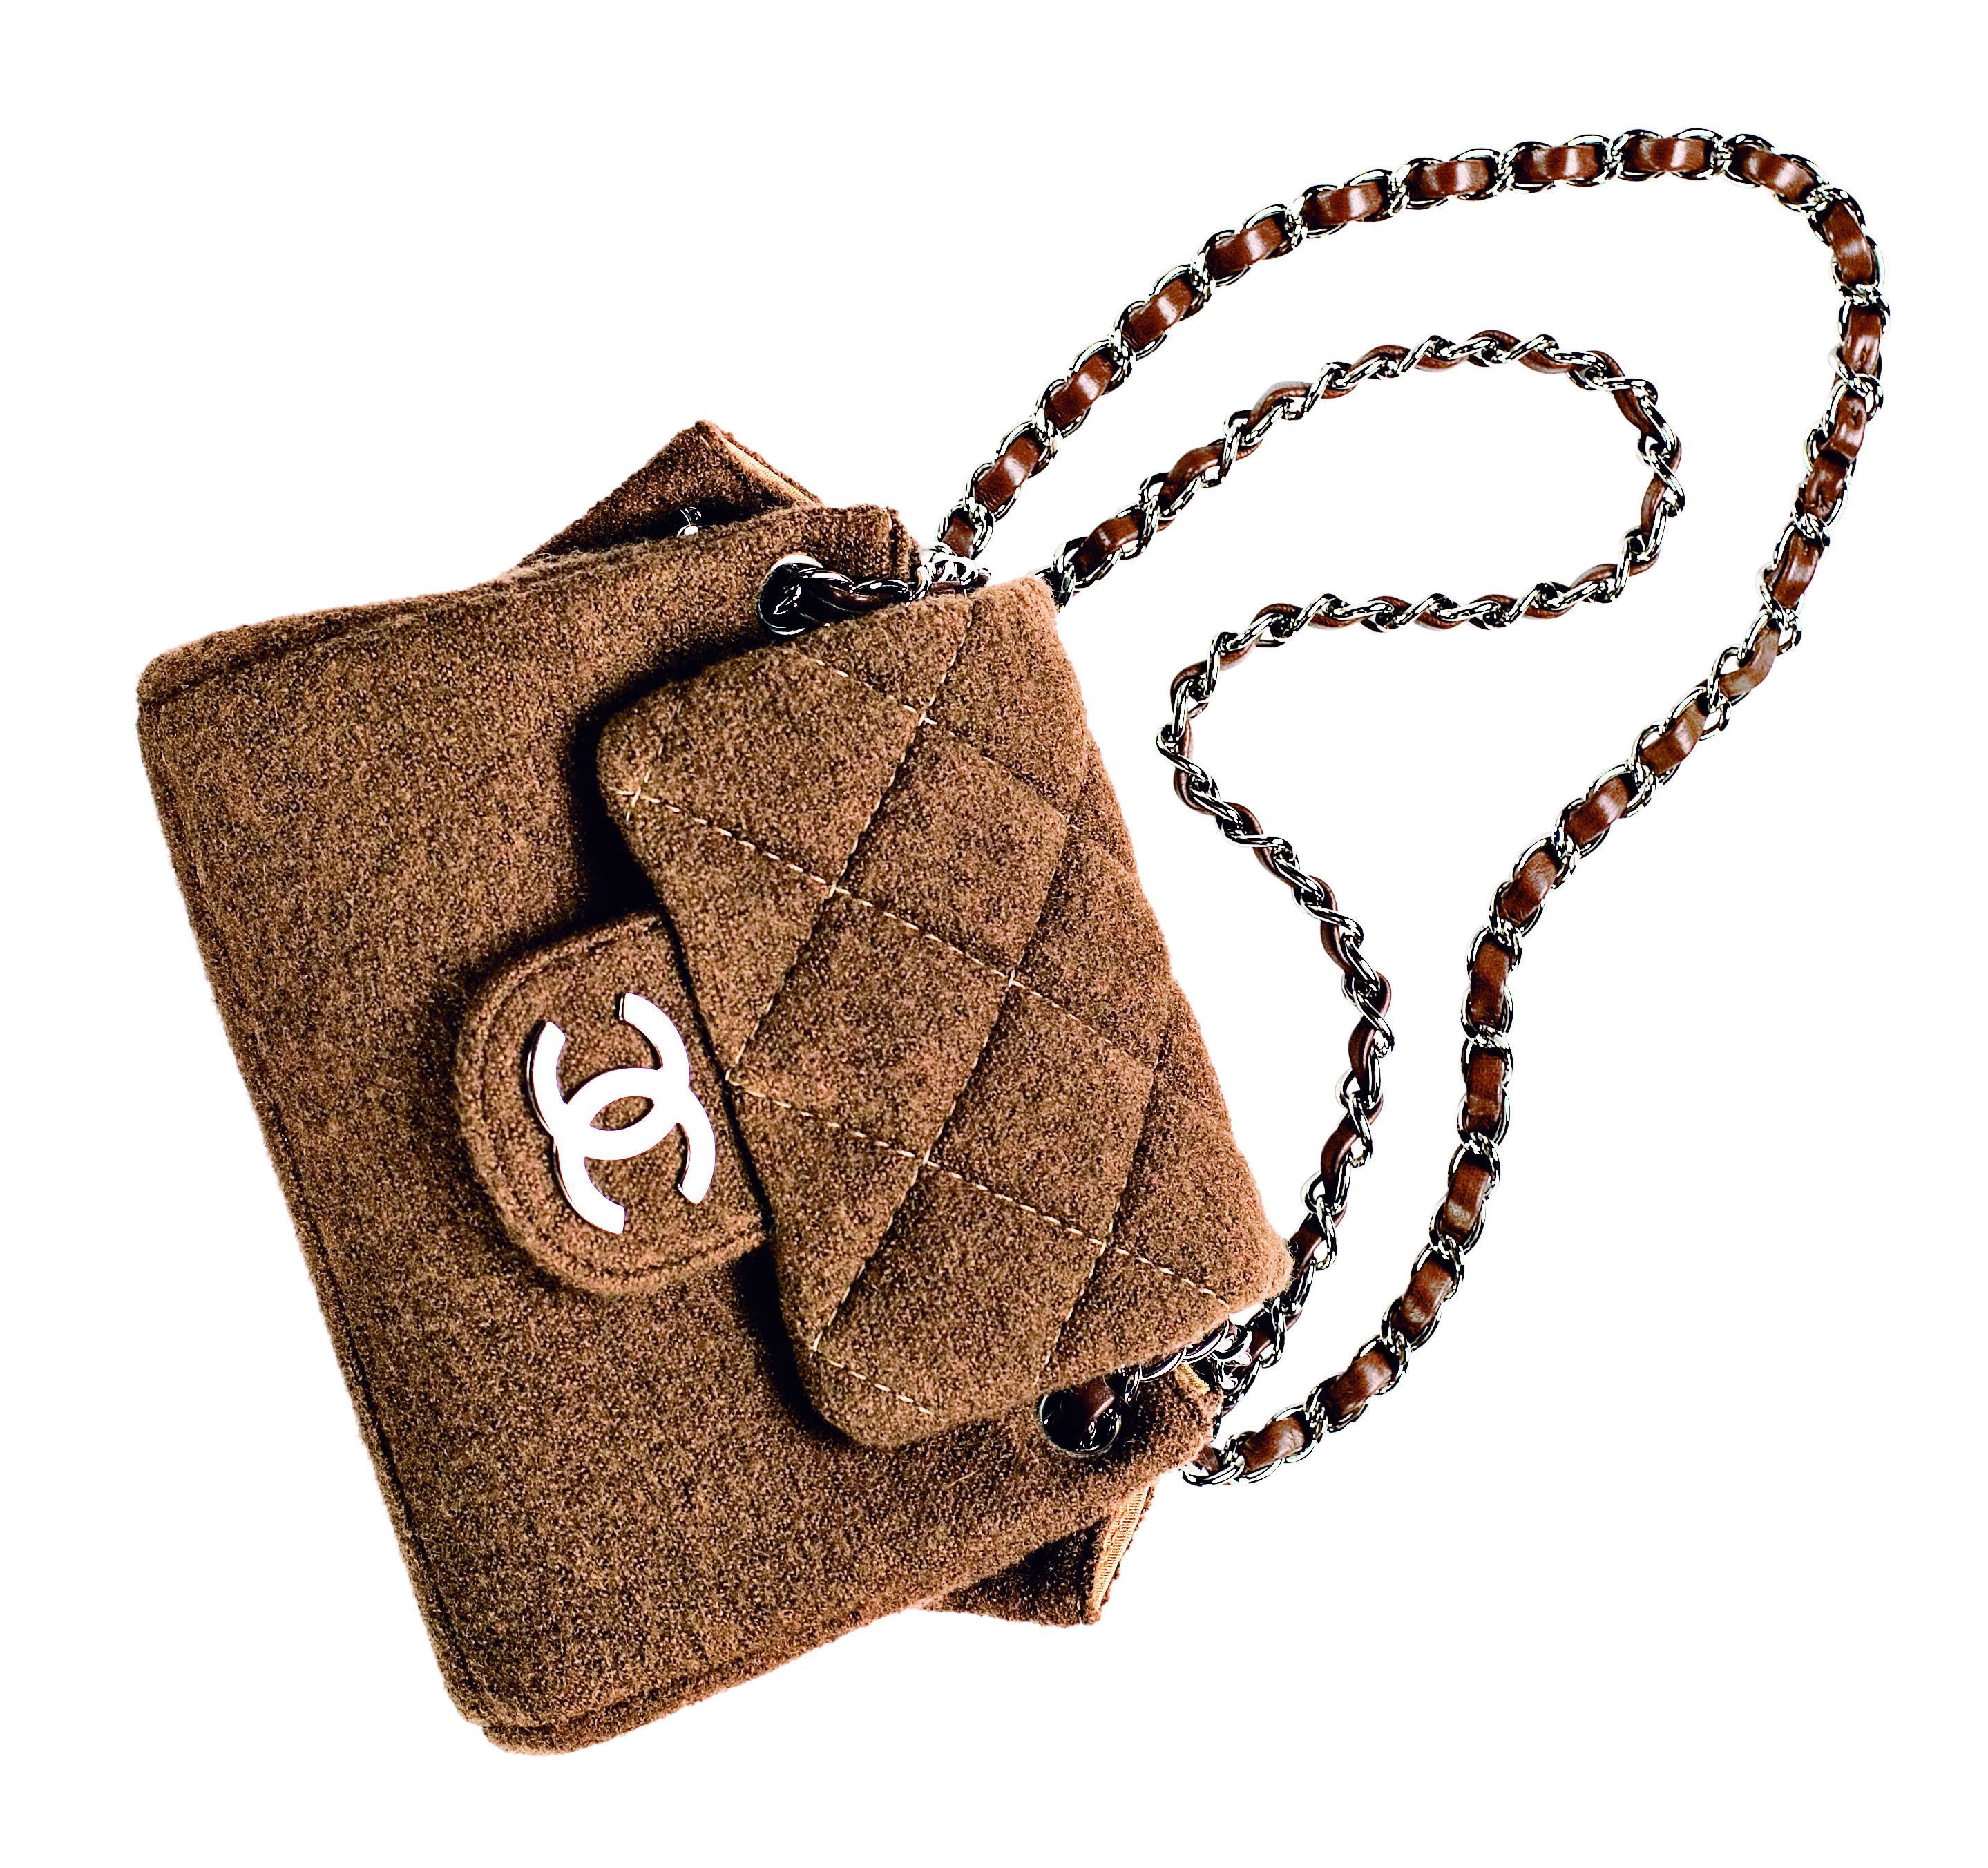 cc brun taske 8100 442W5274.jpg